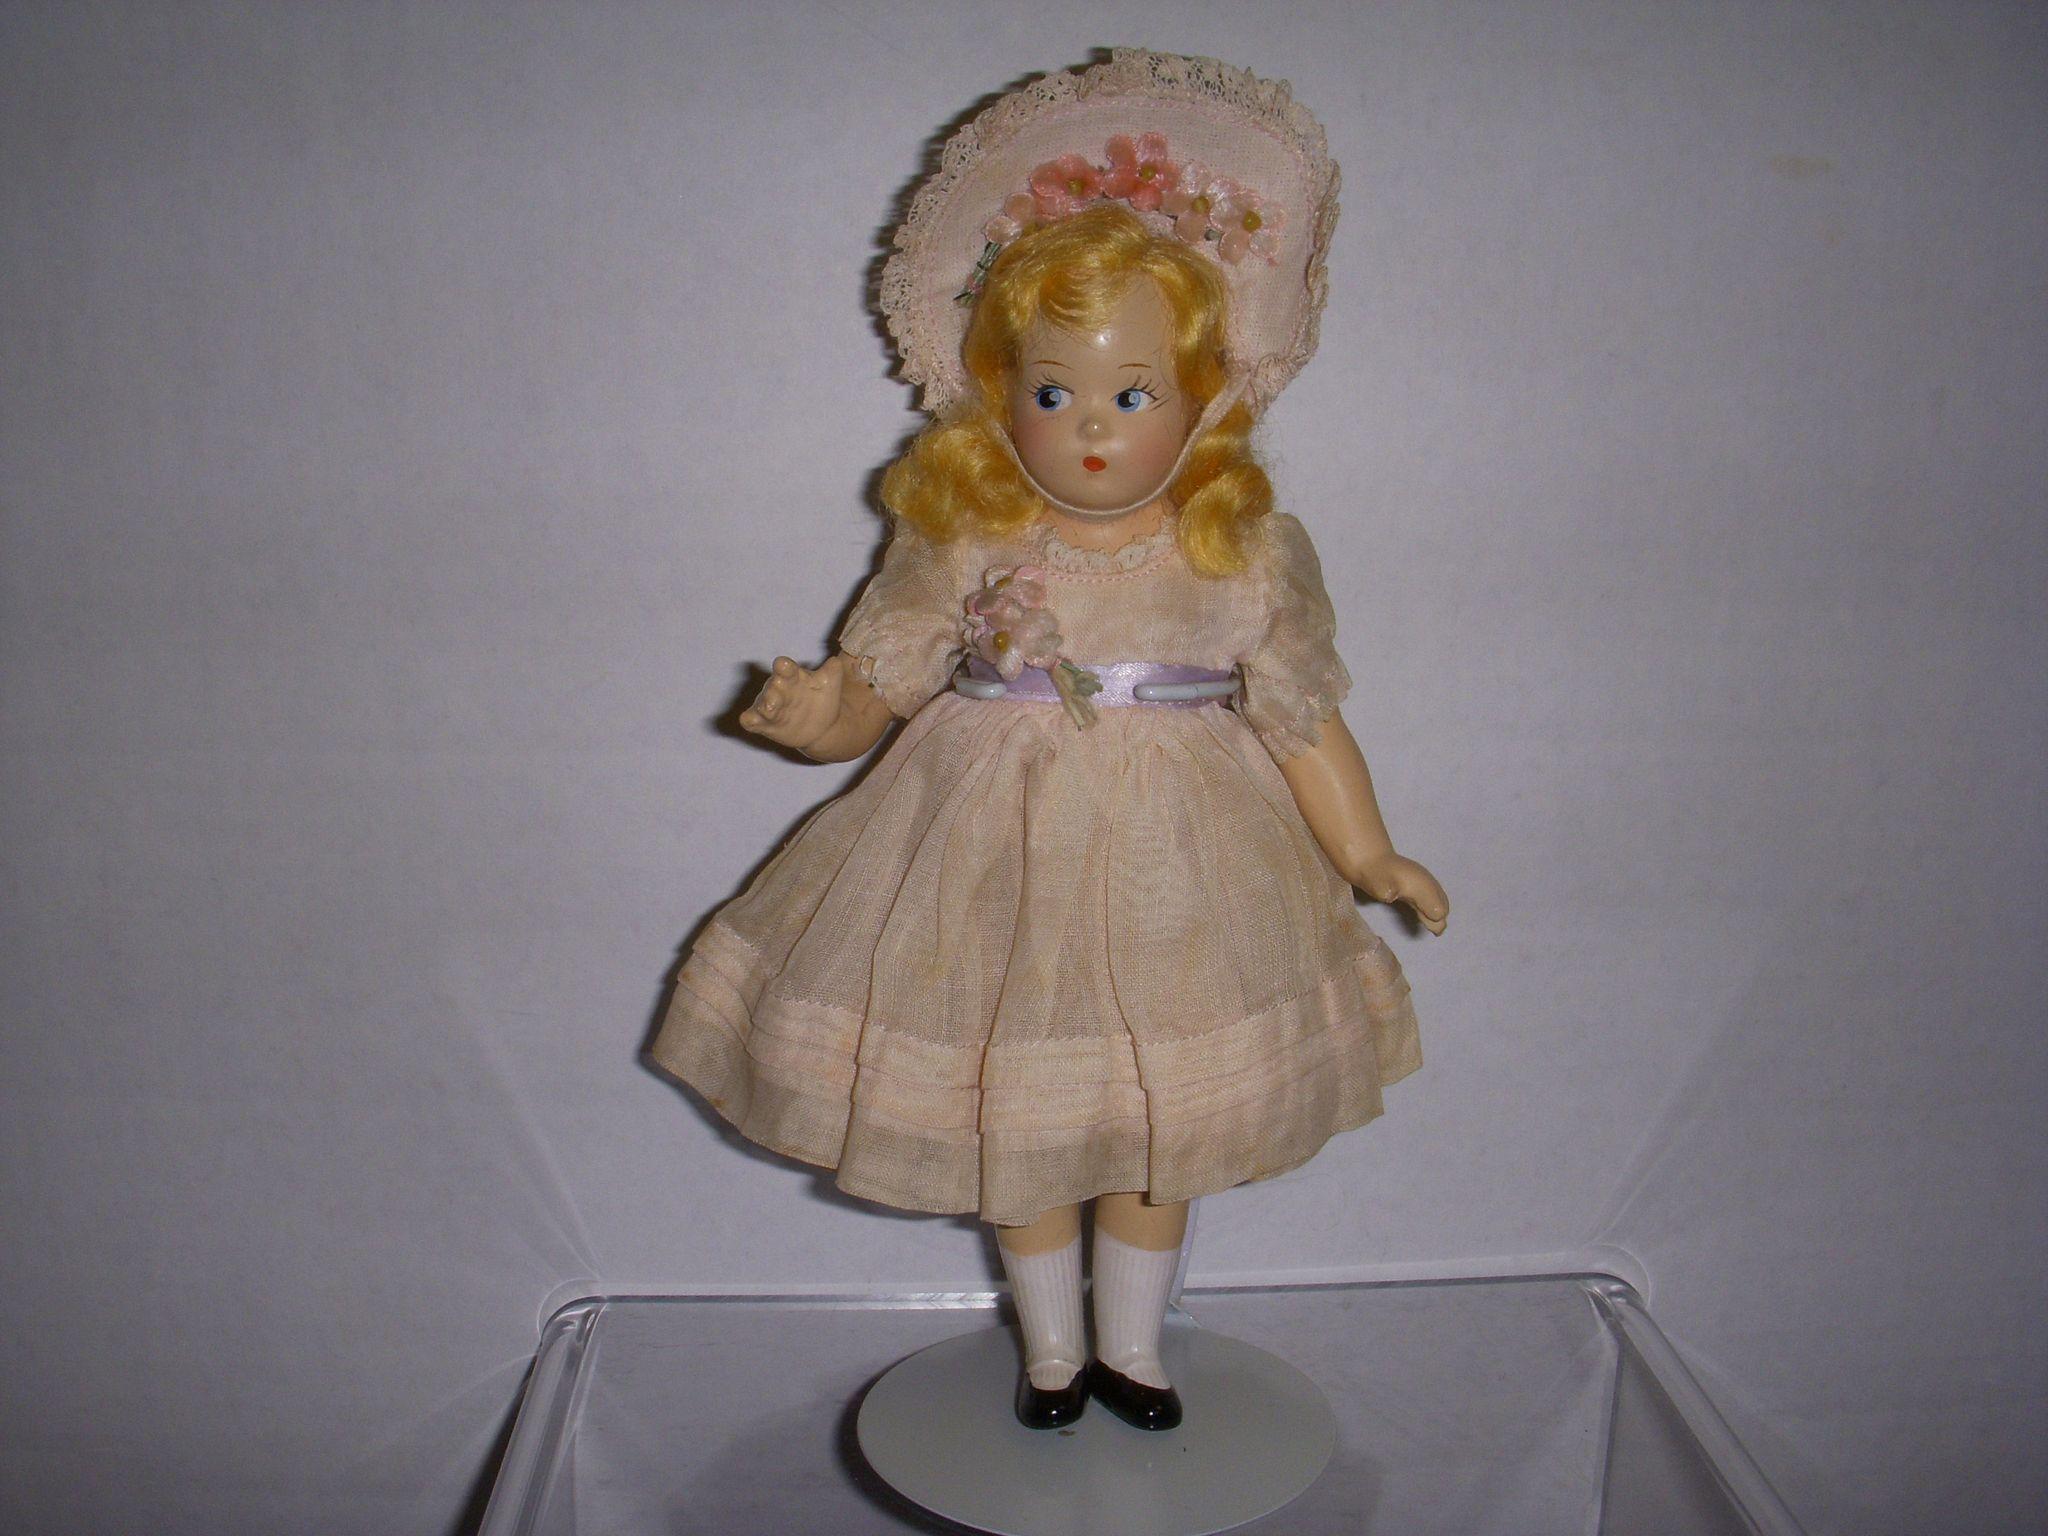 vintage madame alexander tiny betty doll all original from. Black Bedroom Furniture Sets. Home Design Ideas